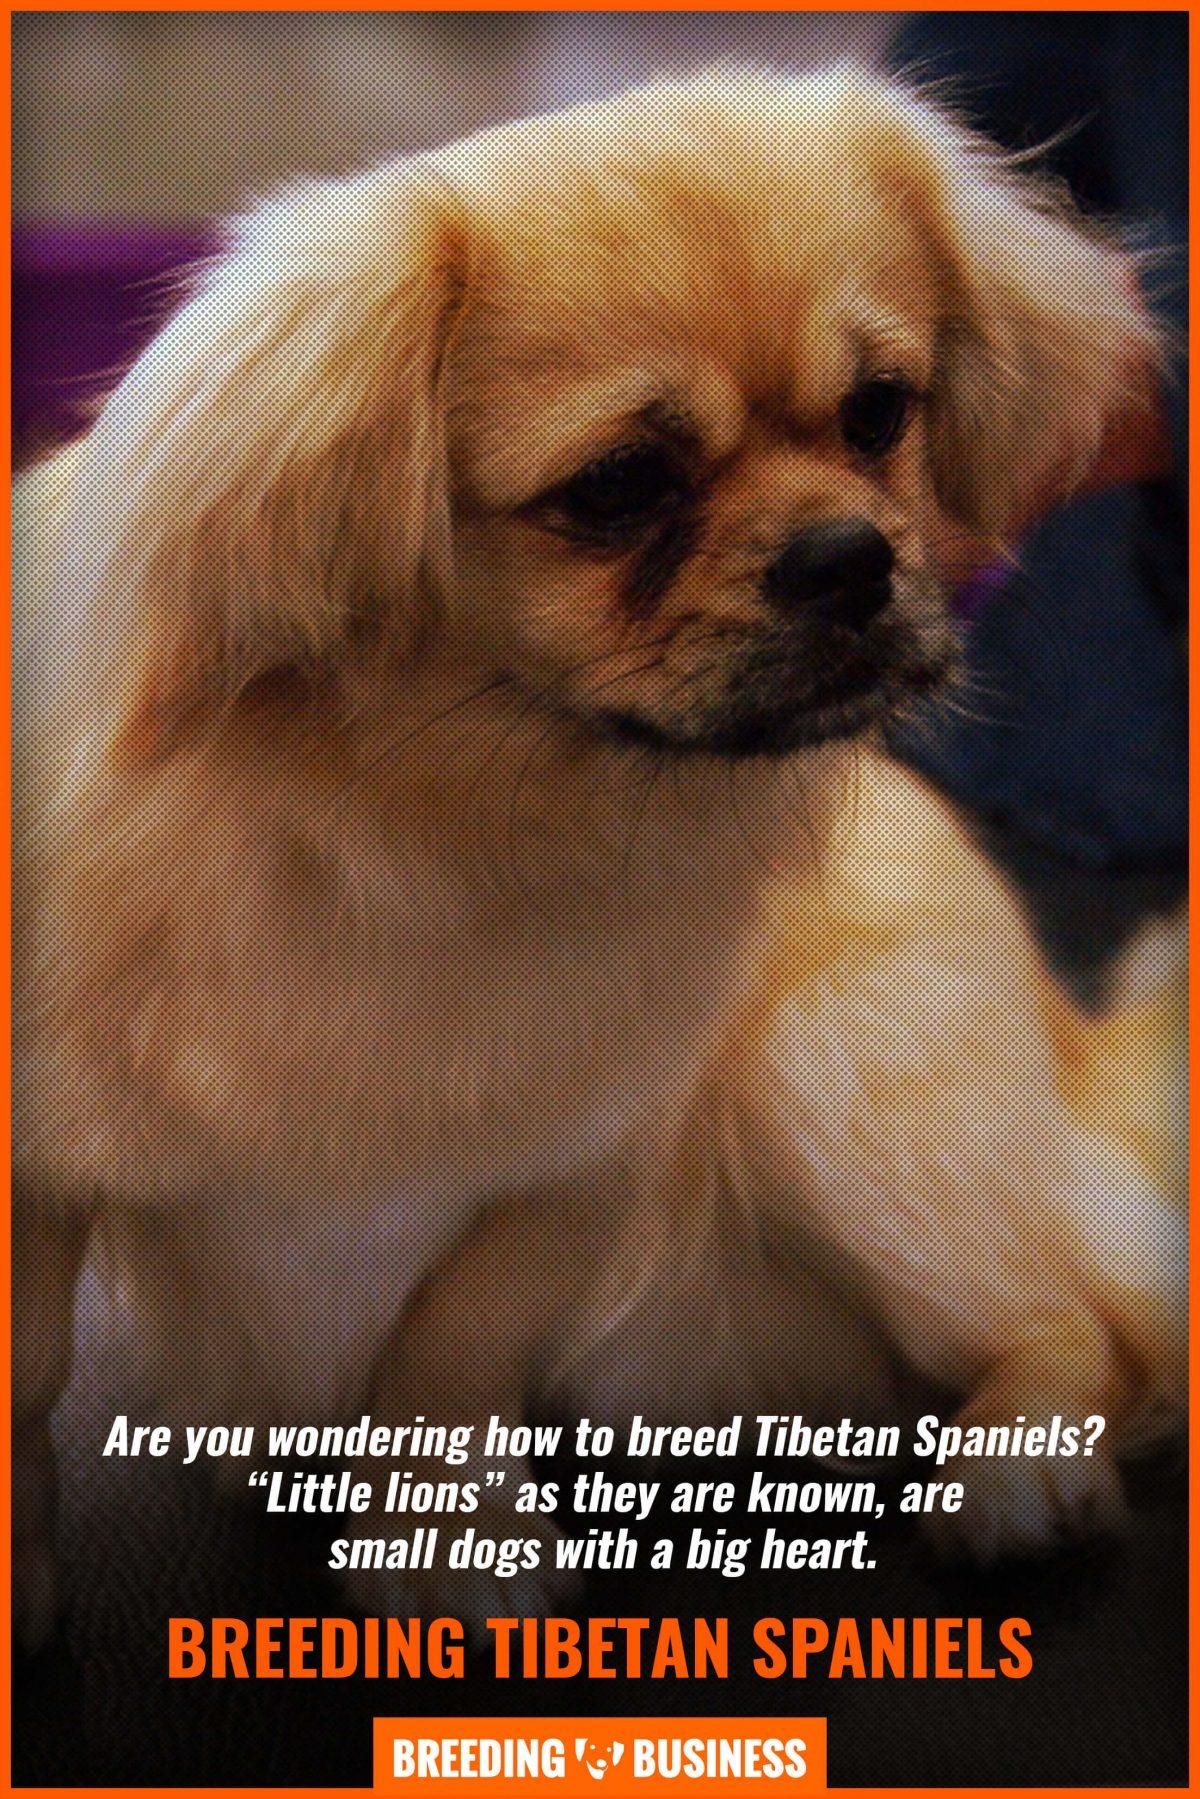 breeding tibetan spaniels